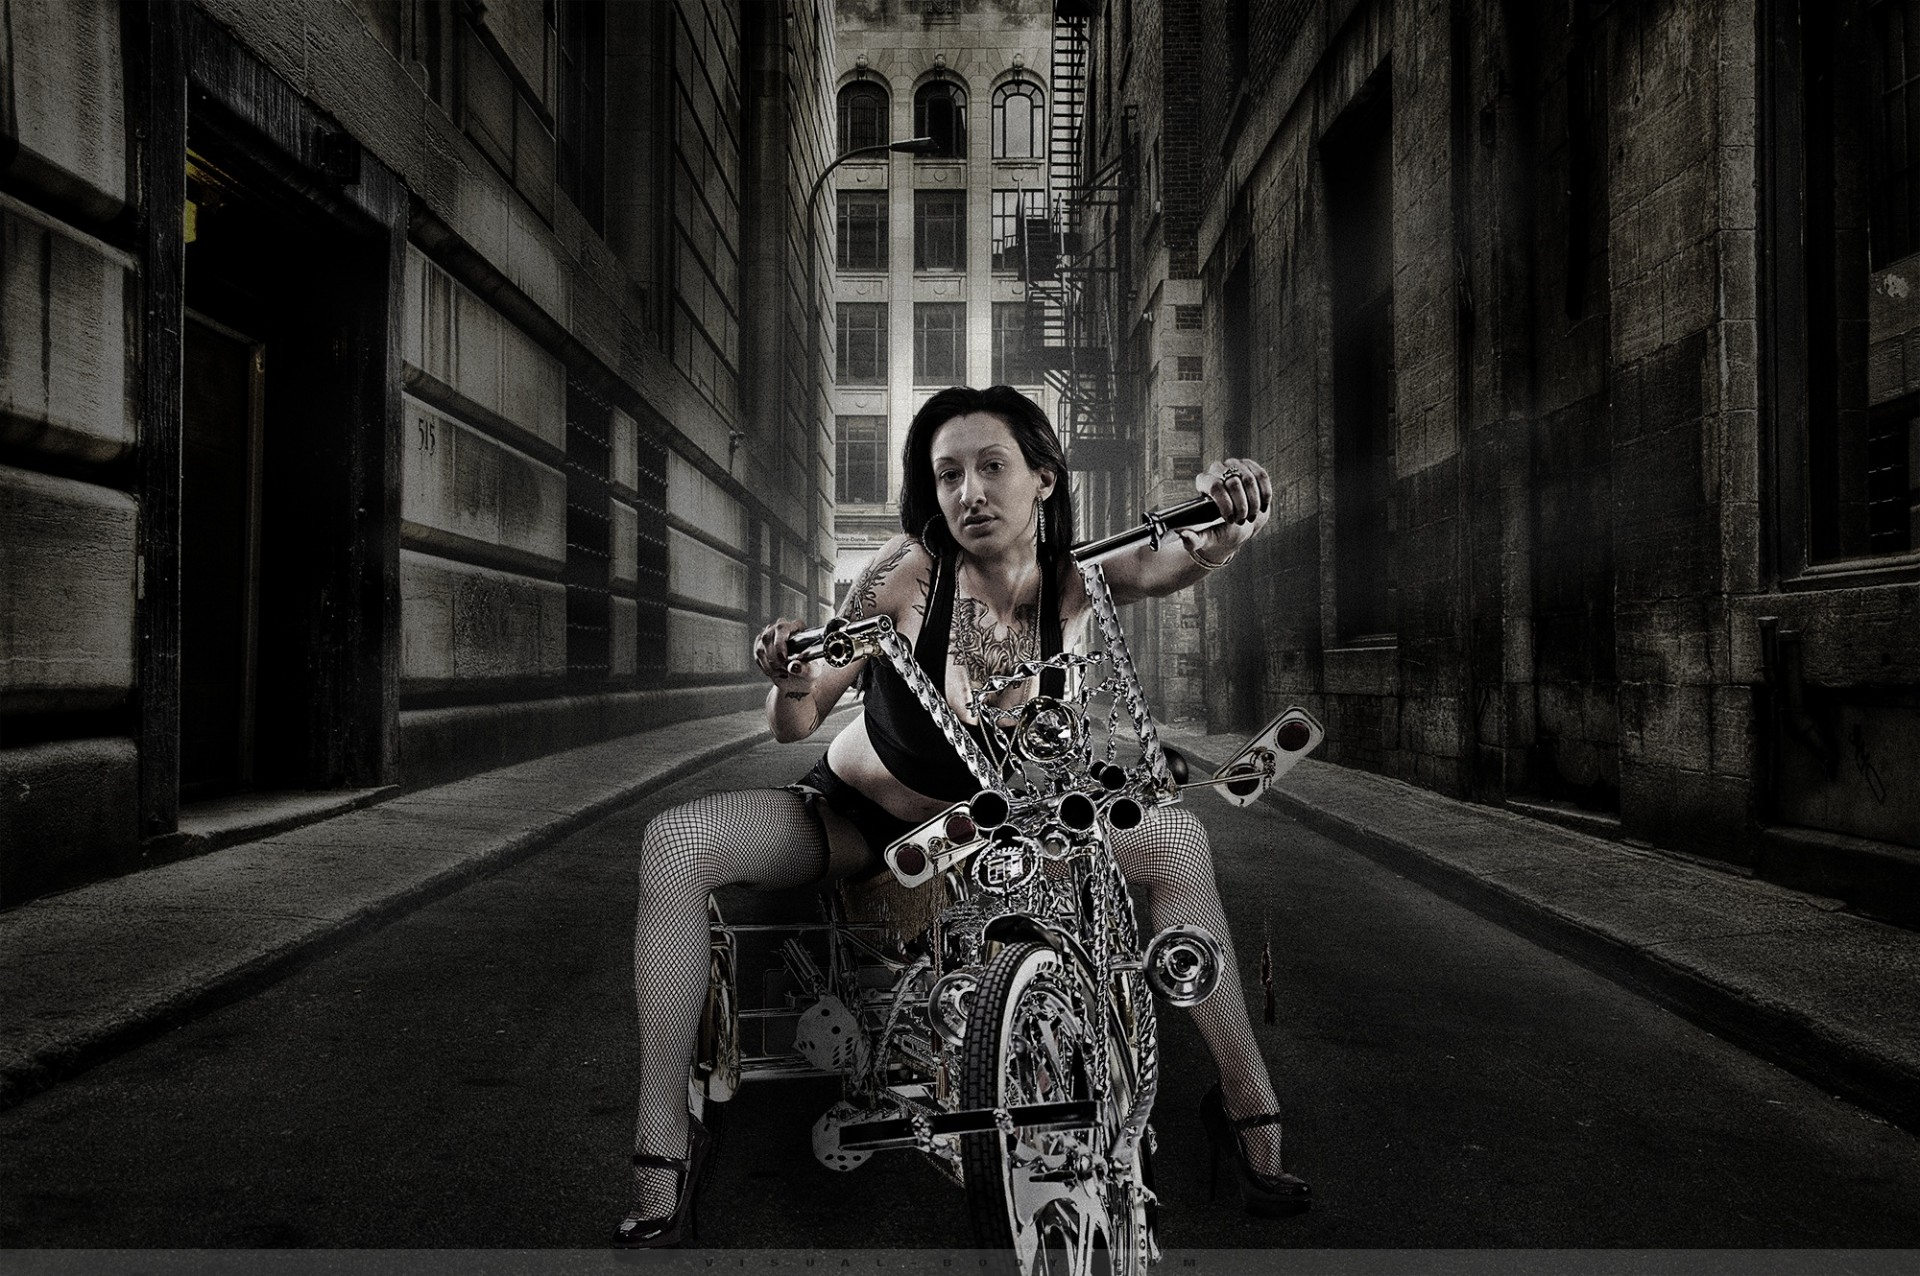 Urban Life I - La bikeuse